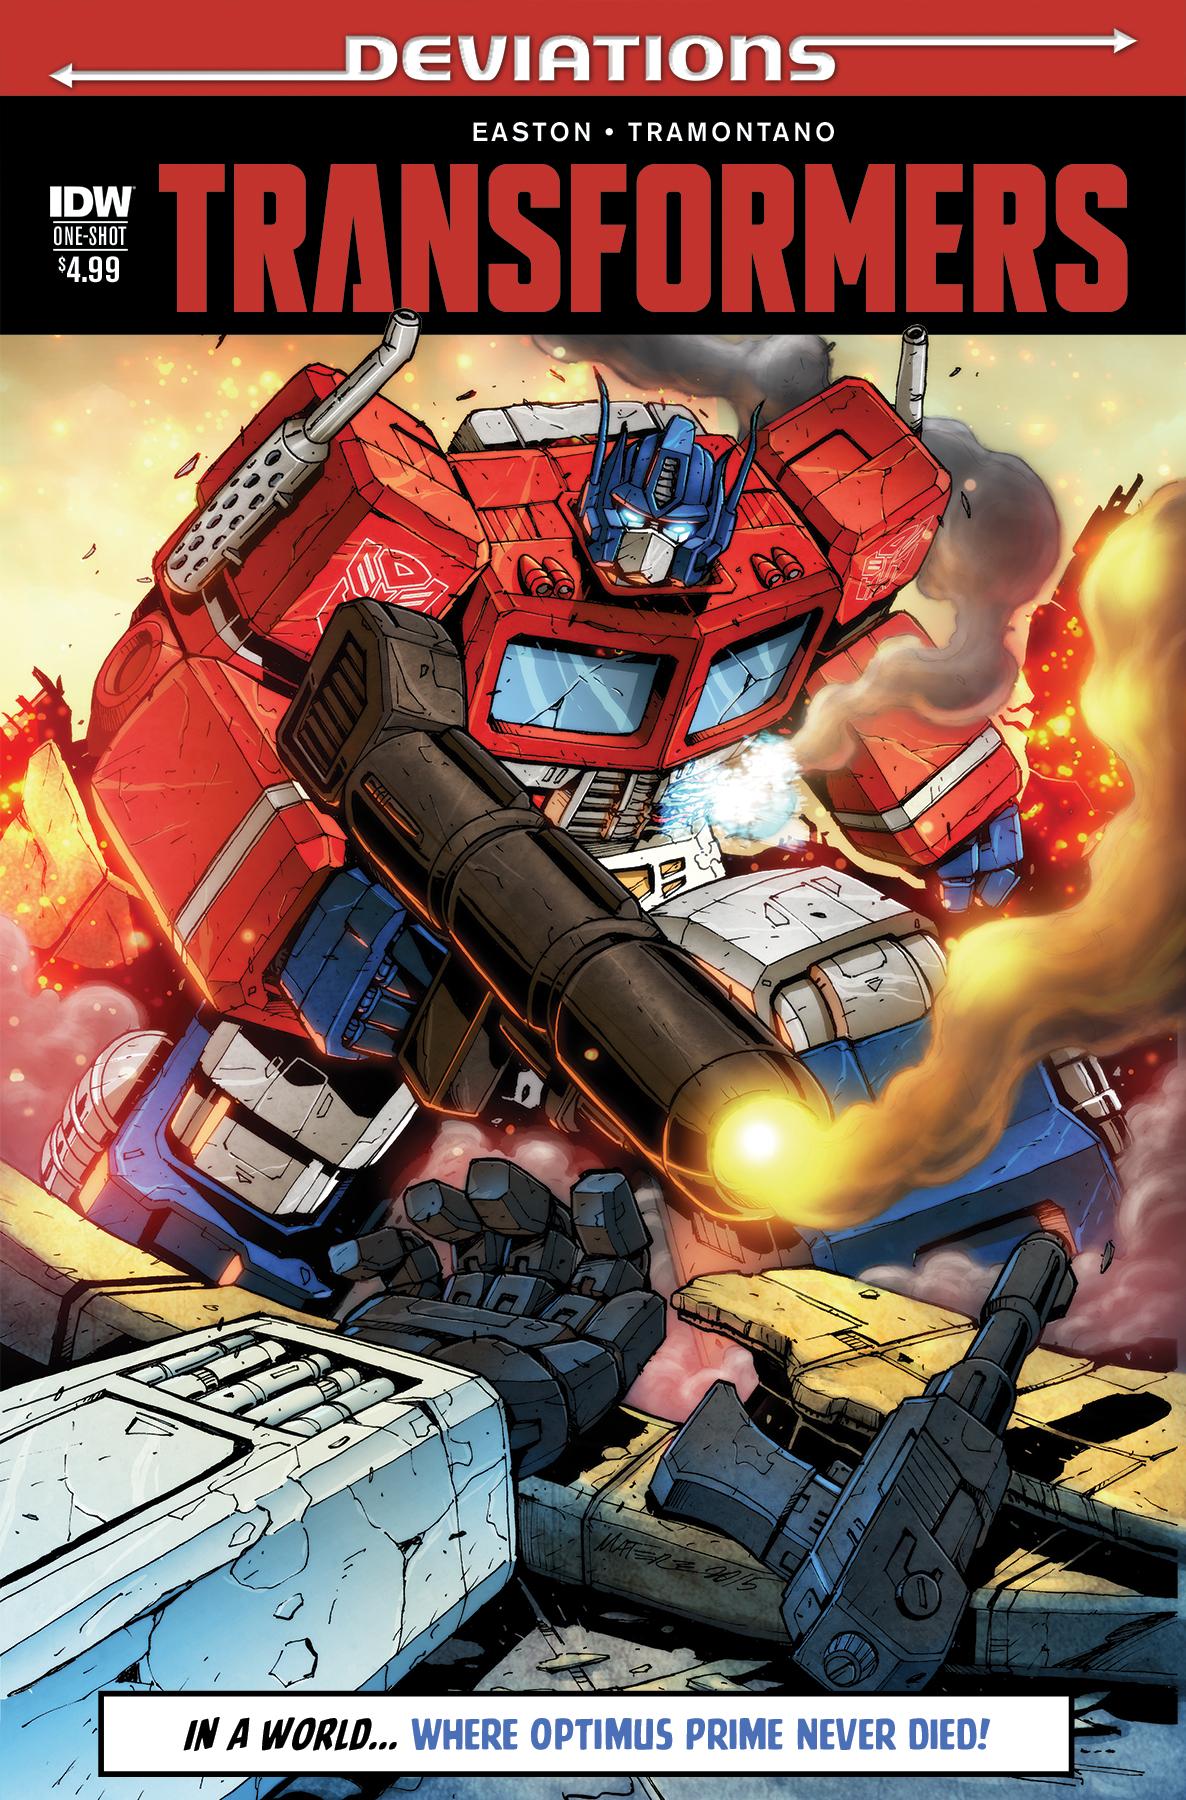 Transformers Deviations Cover